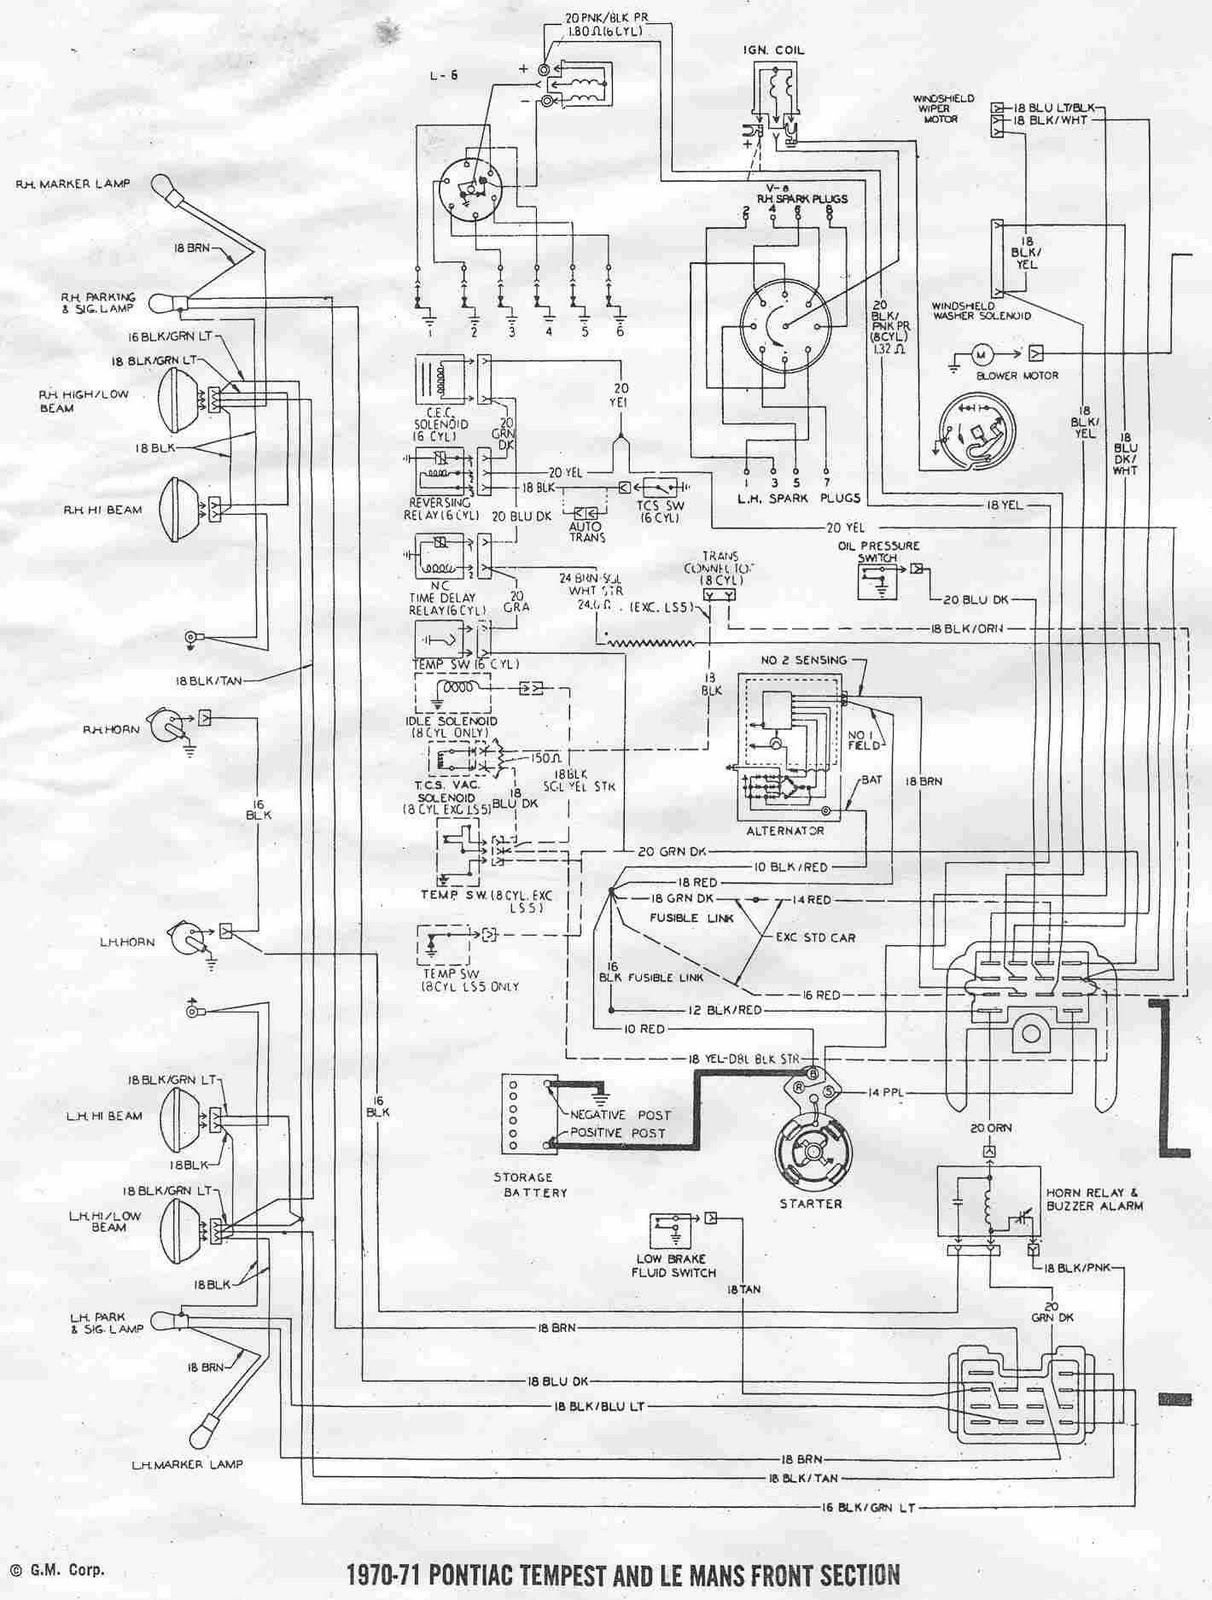 67 gto light wiring diagram 18 1 stromoeko de u202266 gto wiring diagram wiring diagram [ 1212 x 1600 Pixel ]